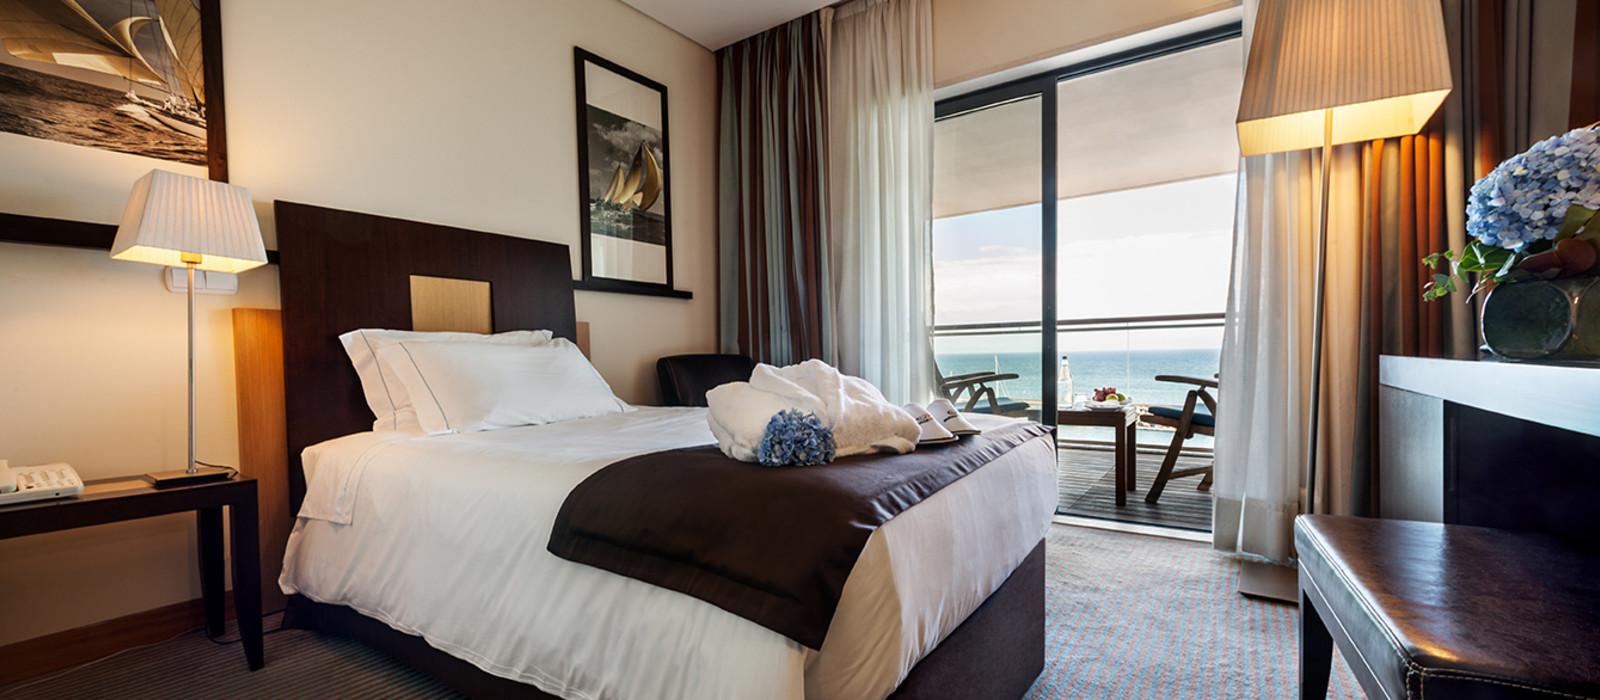 Hotel Marina Atlantico Portugal